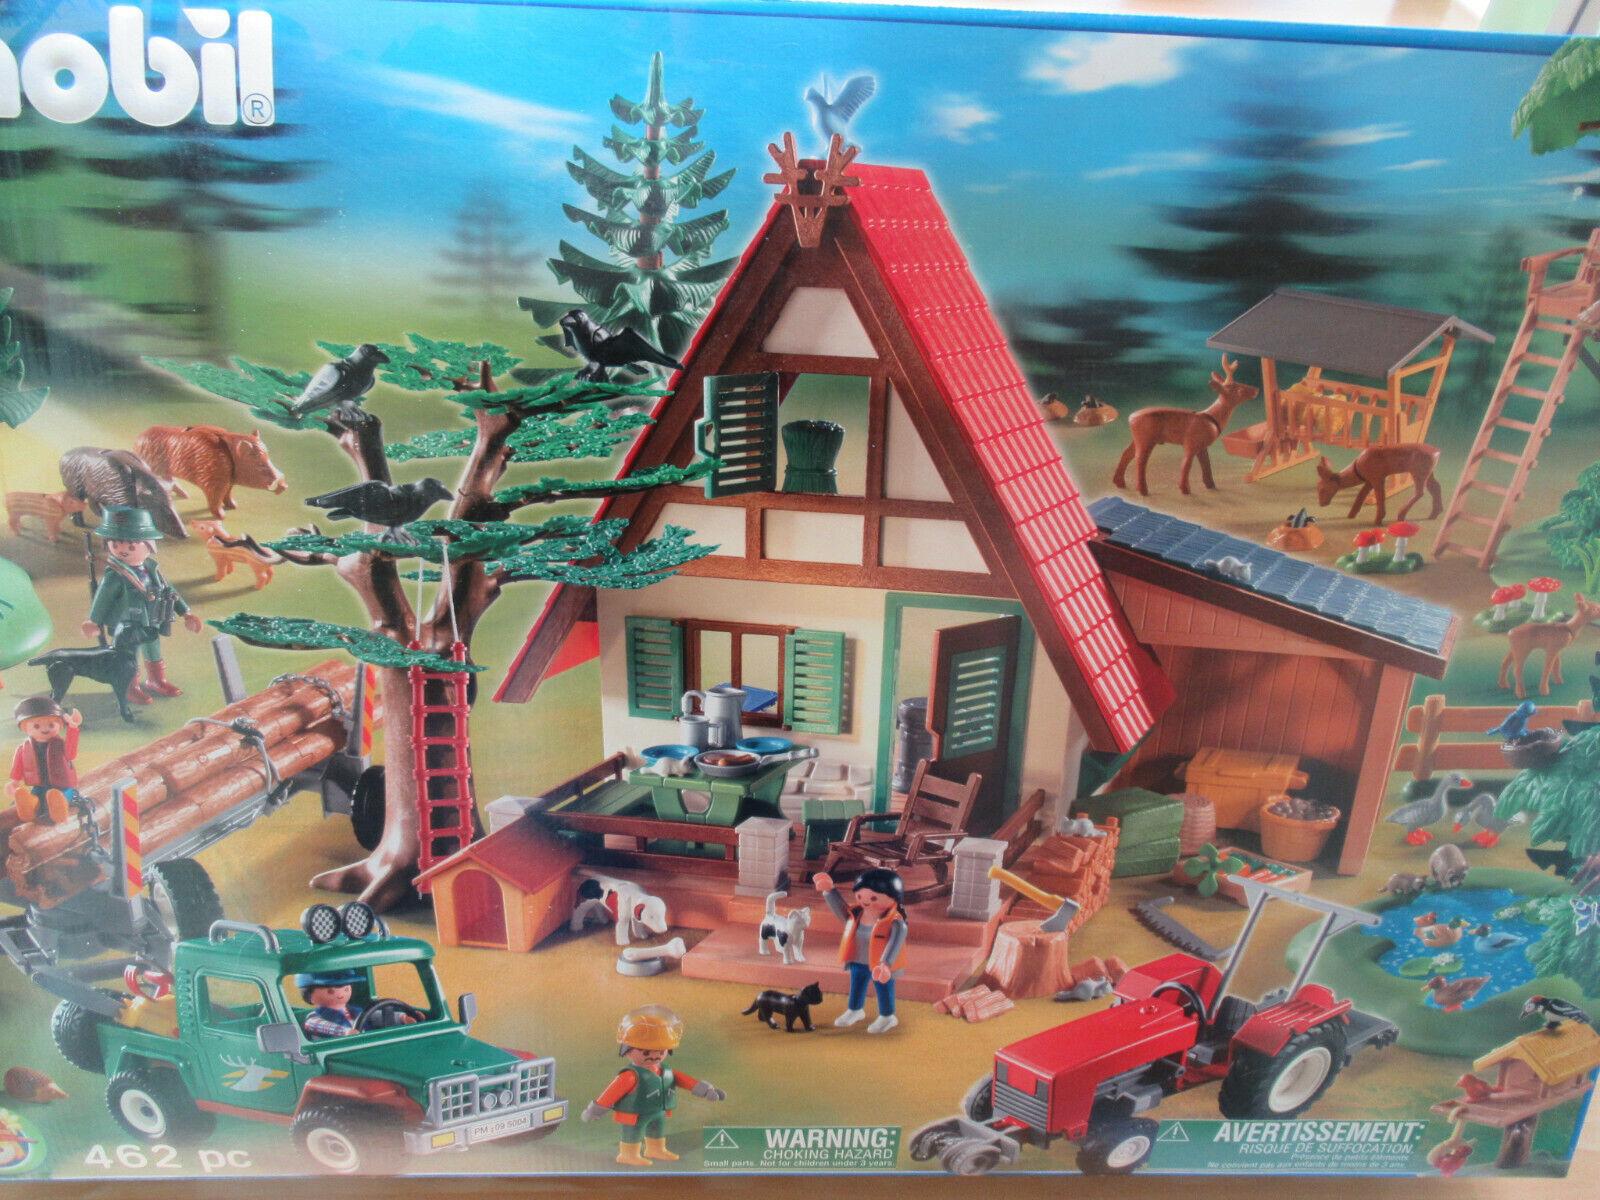 Nouveau Playmobil 5004 Forsthaus Mega Set Spécial Série Galeria sapes dans neuf dans sa boîte AD